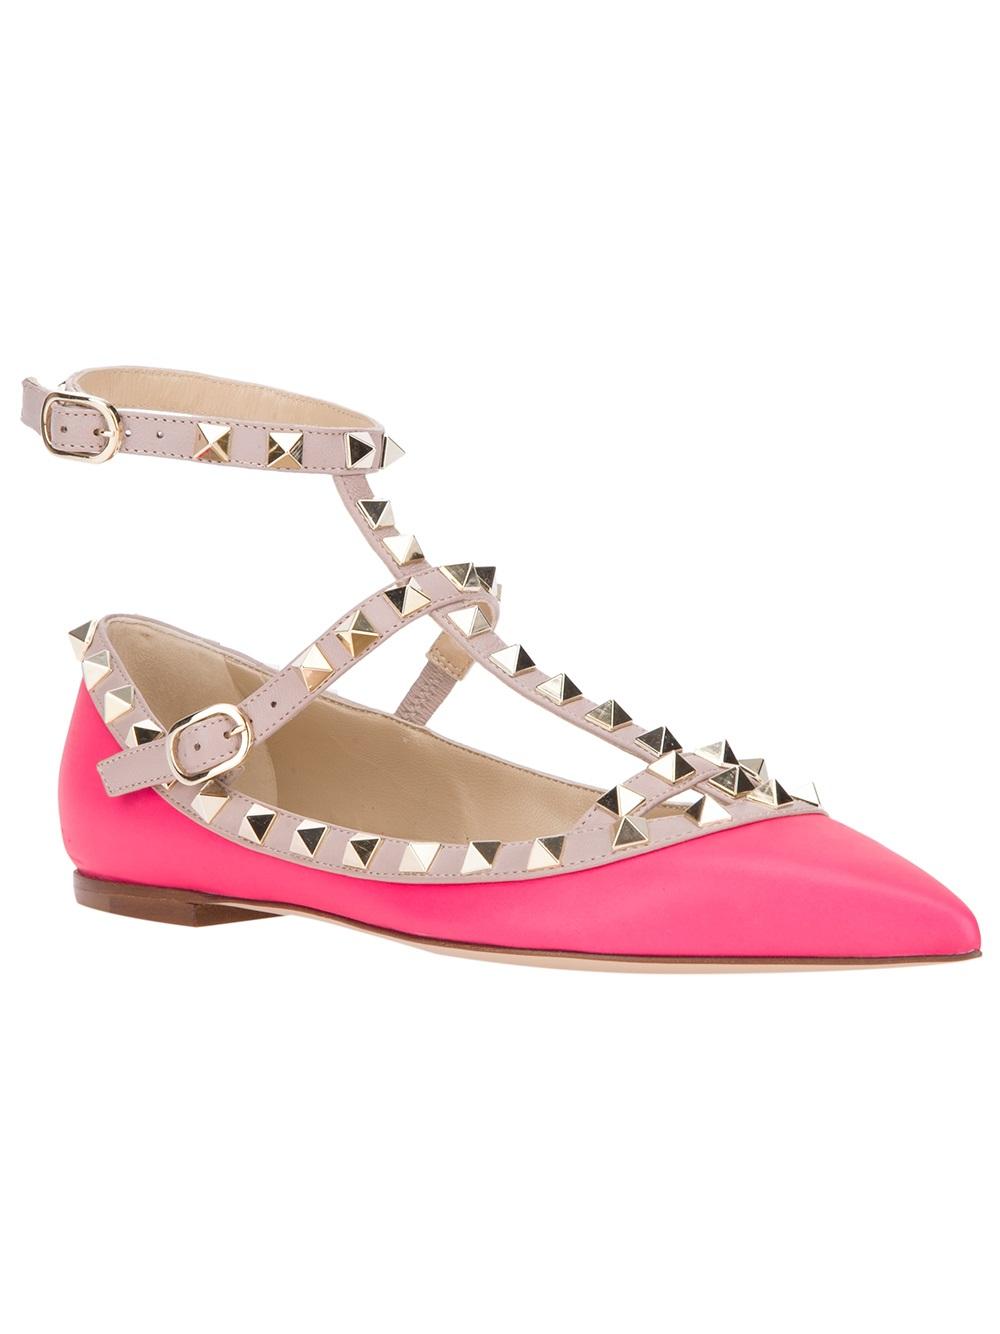 Valentino Pink Valentino Garavani Rockstud Ballerina Flats obDGMt